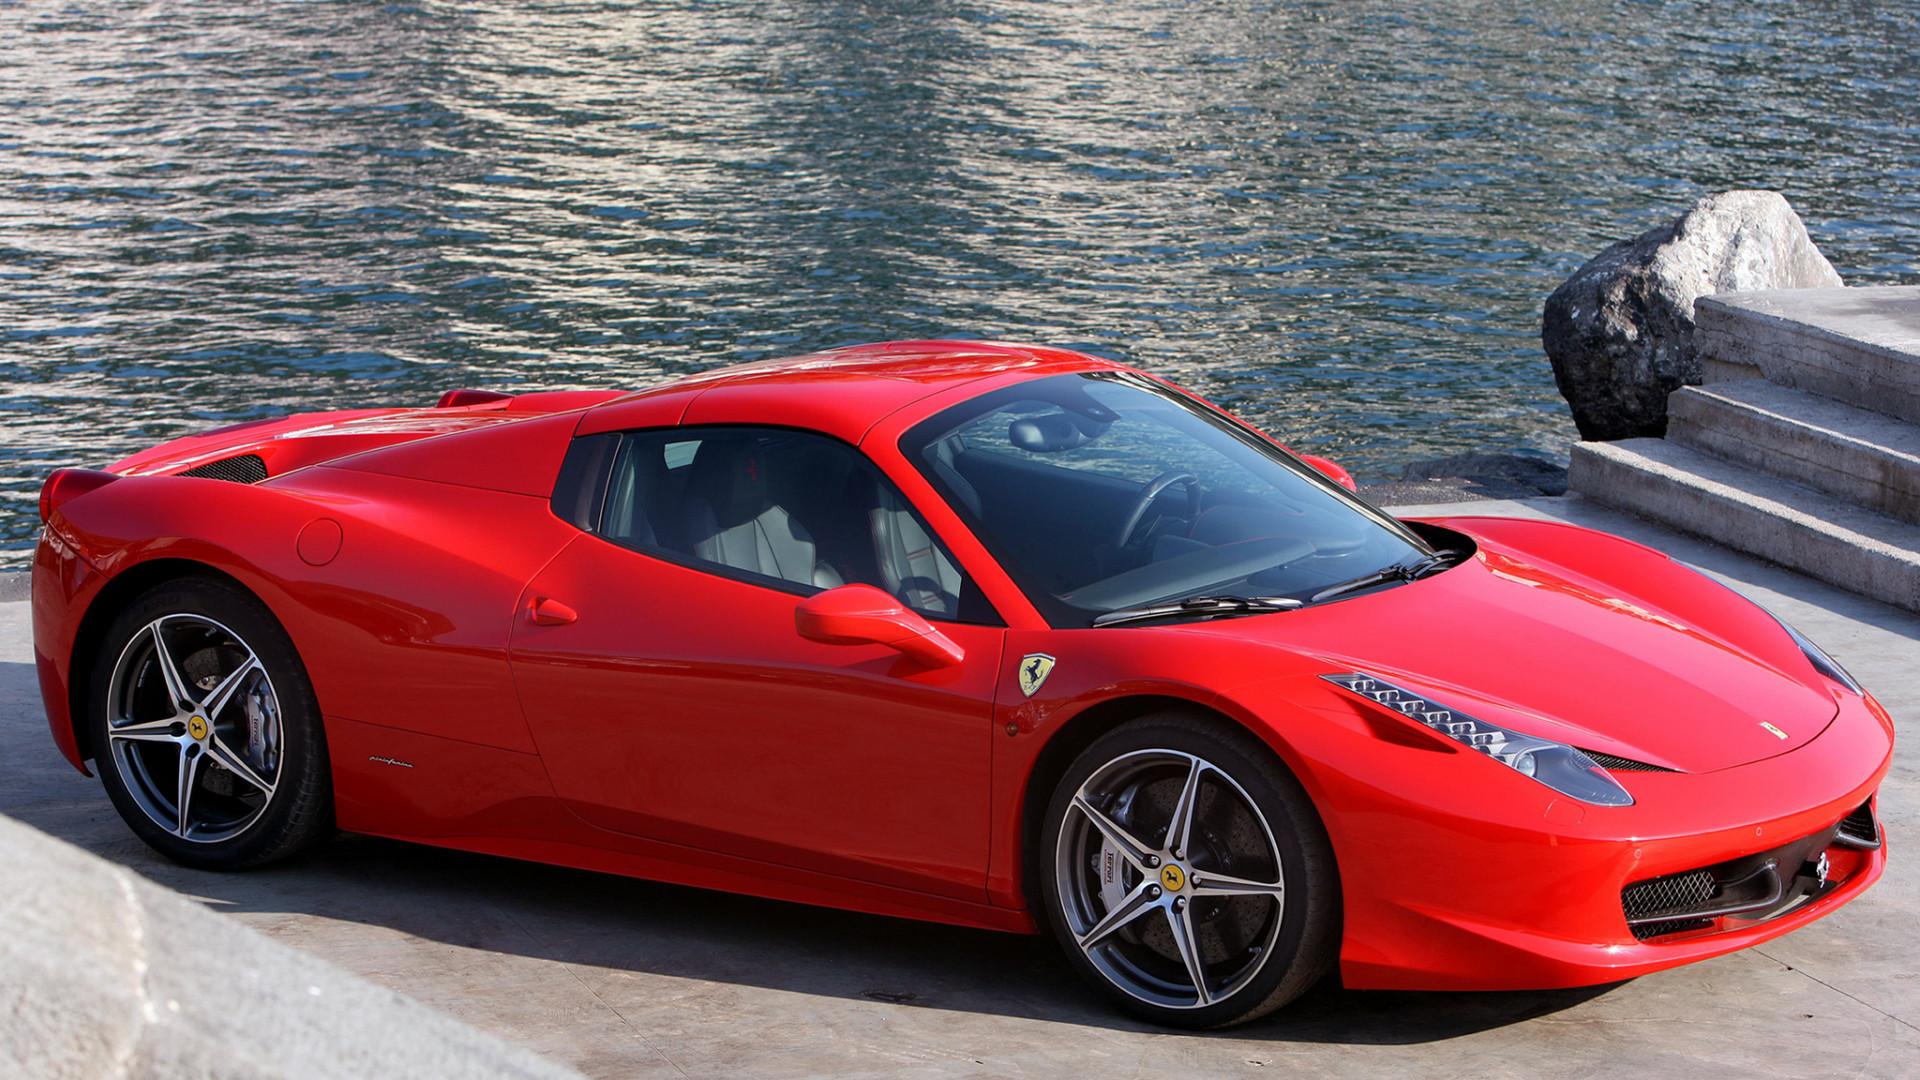 Download Ferrari 458 Italia Liberty Walk Wallpaper In Blakc N White  Pictures